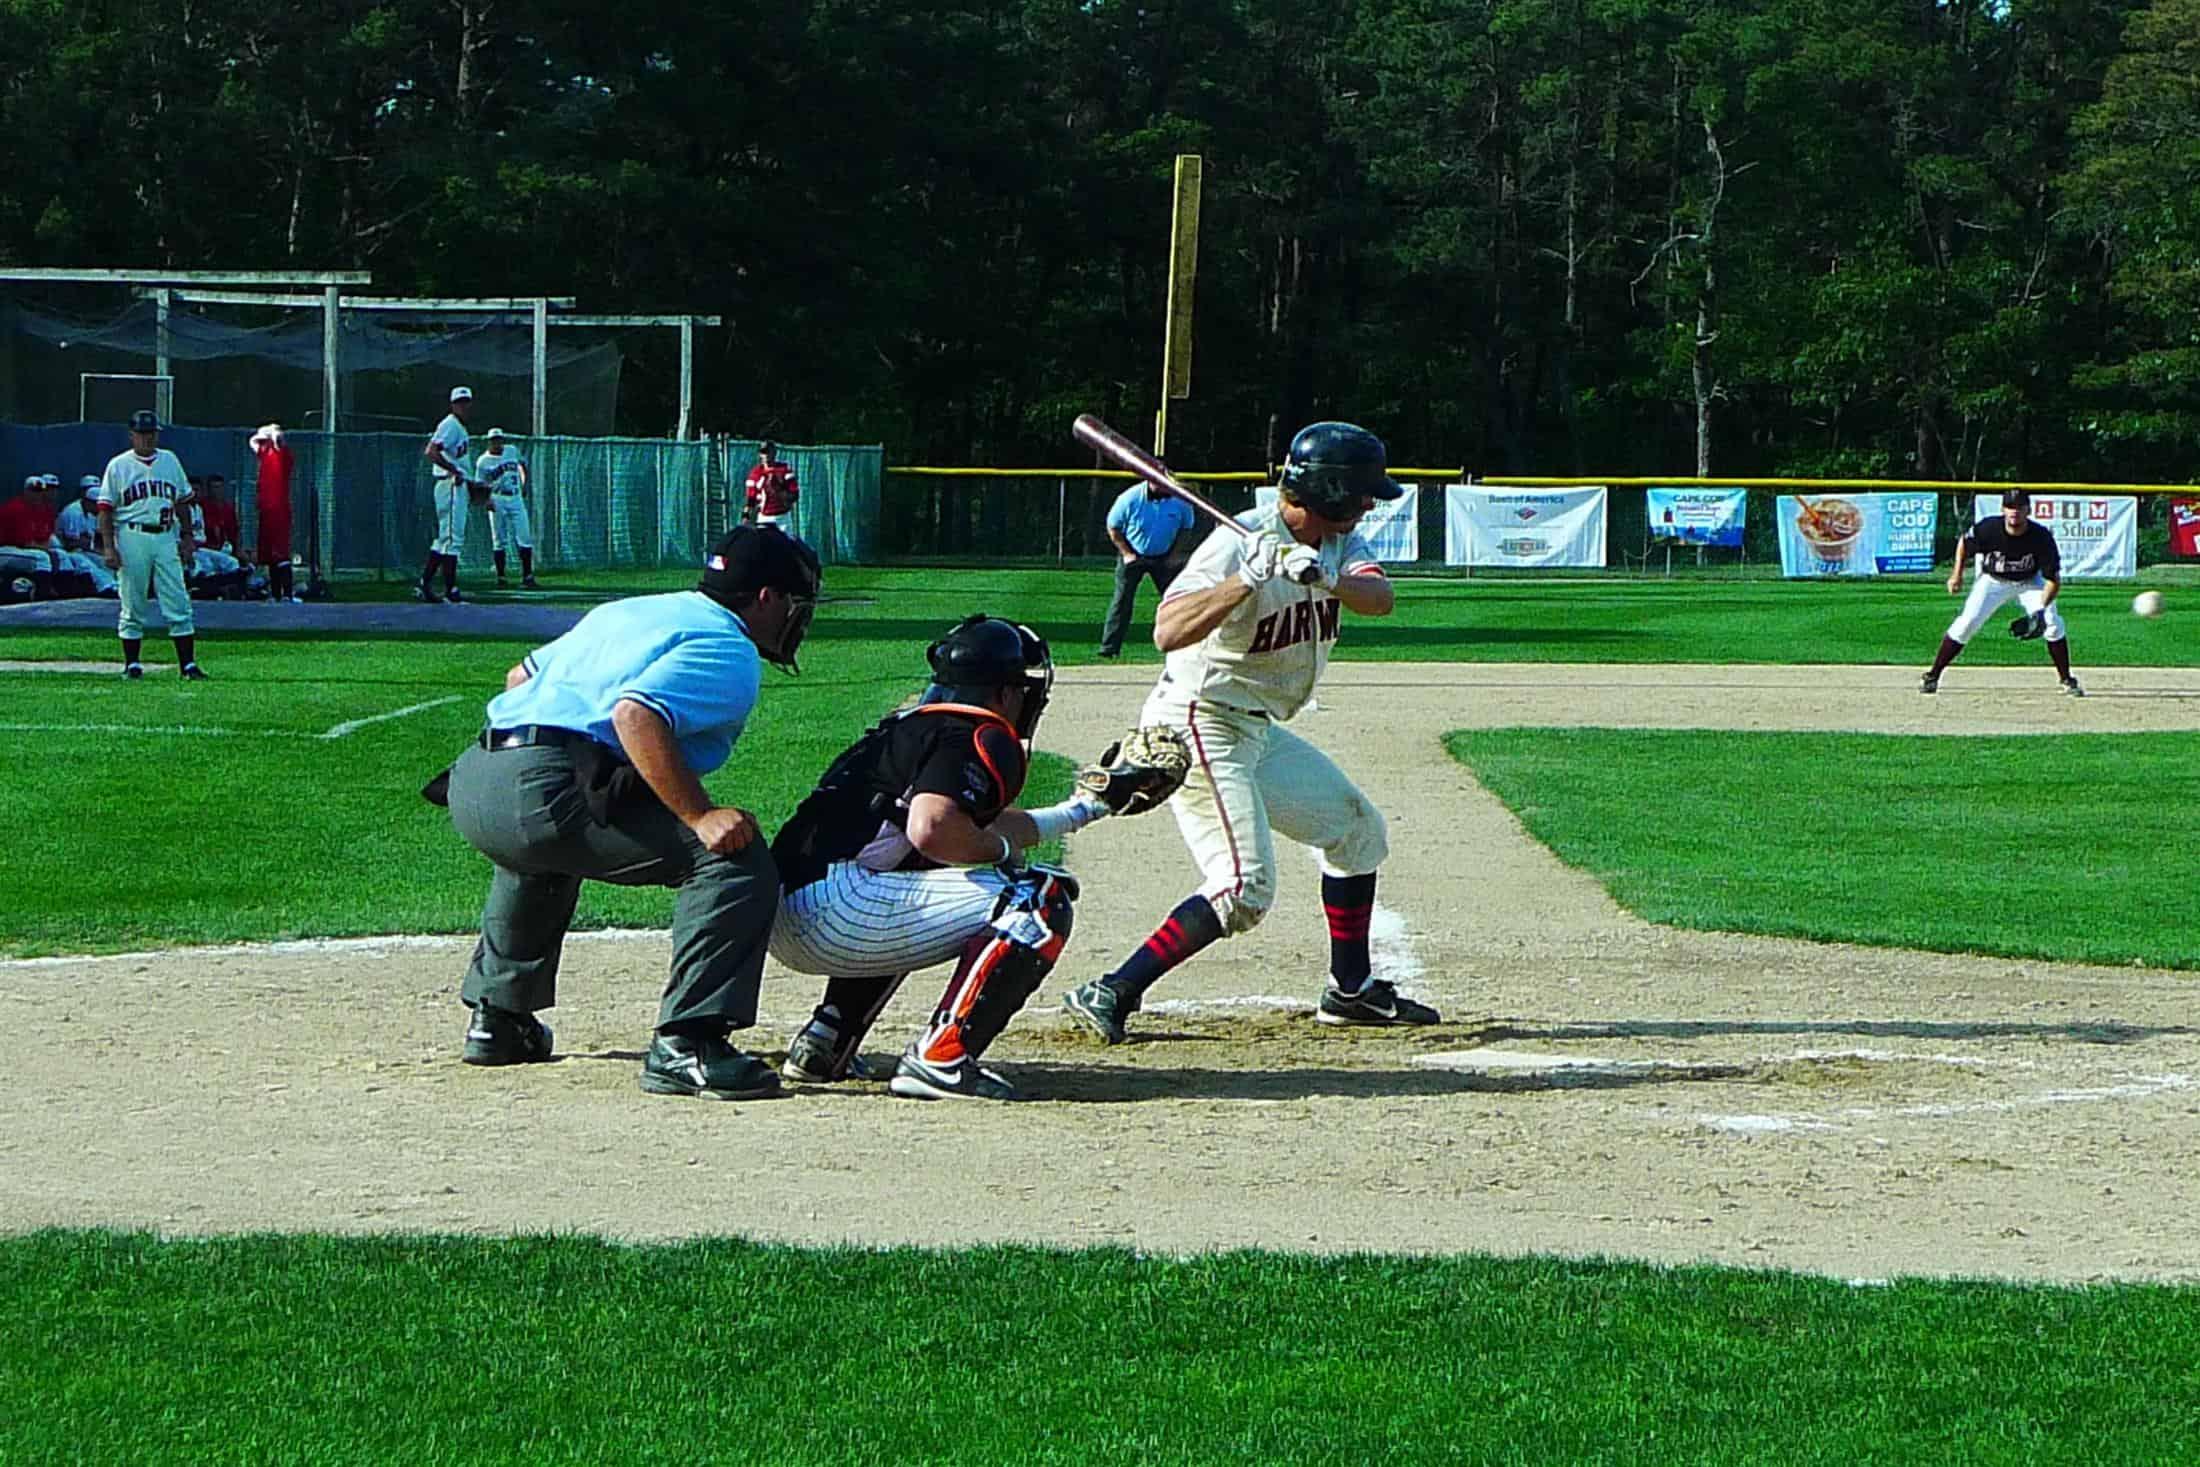 Cape Cod Summer Baseball The Platinum Pebble Boutique Inn